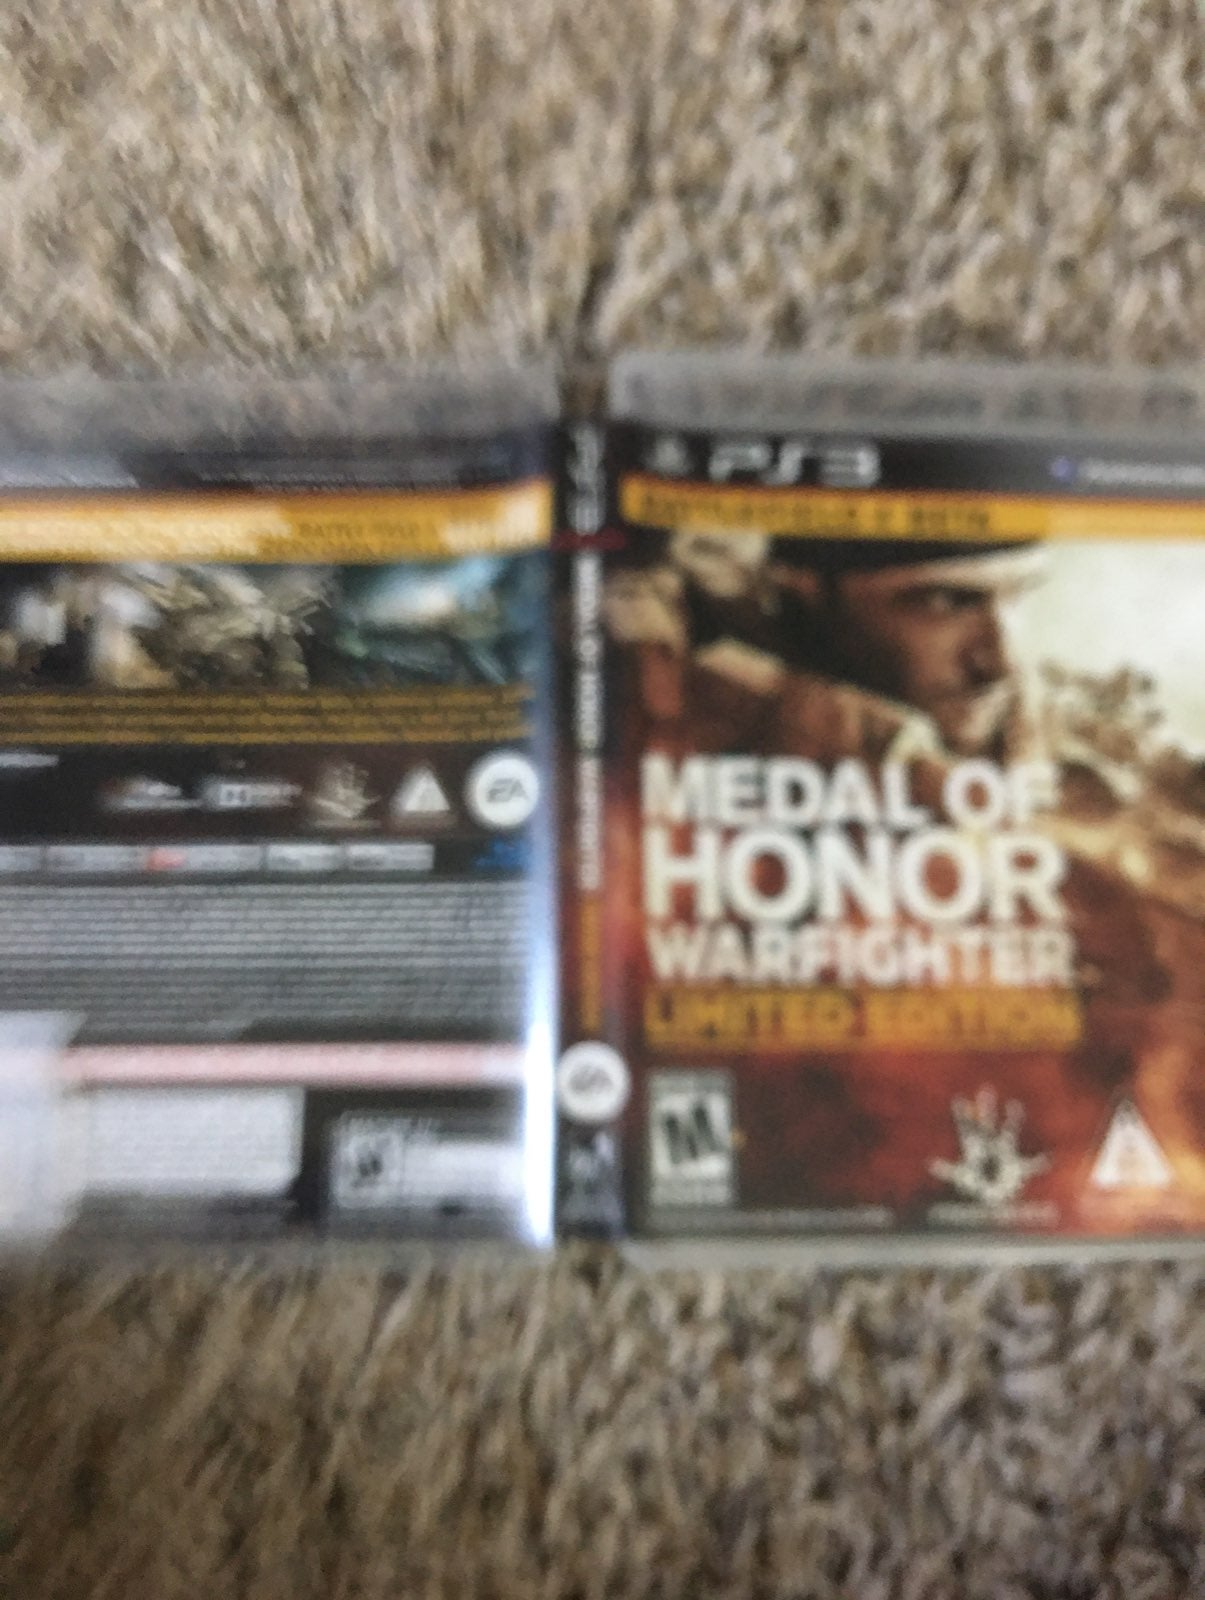 Medal of Honor: Warfighter on Playstatio